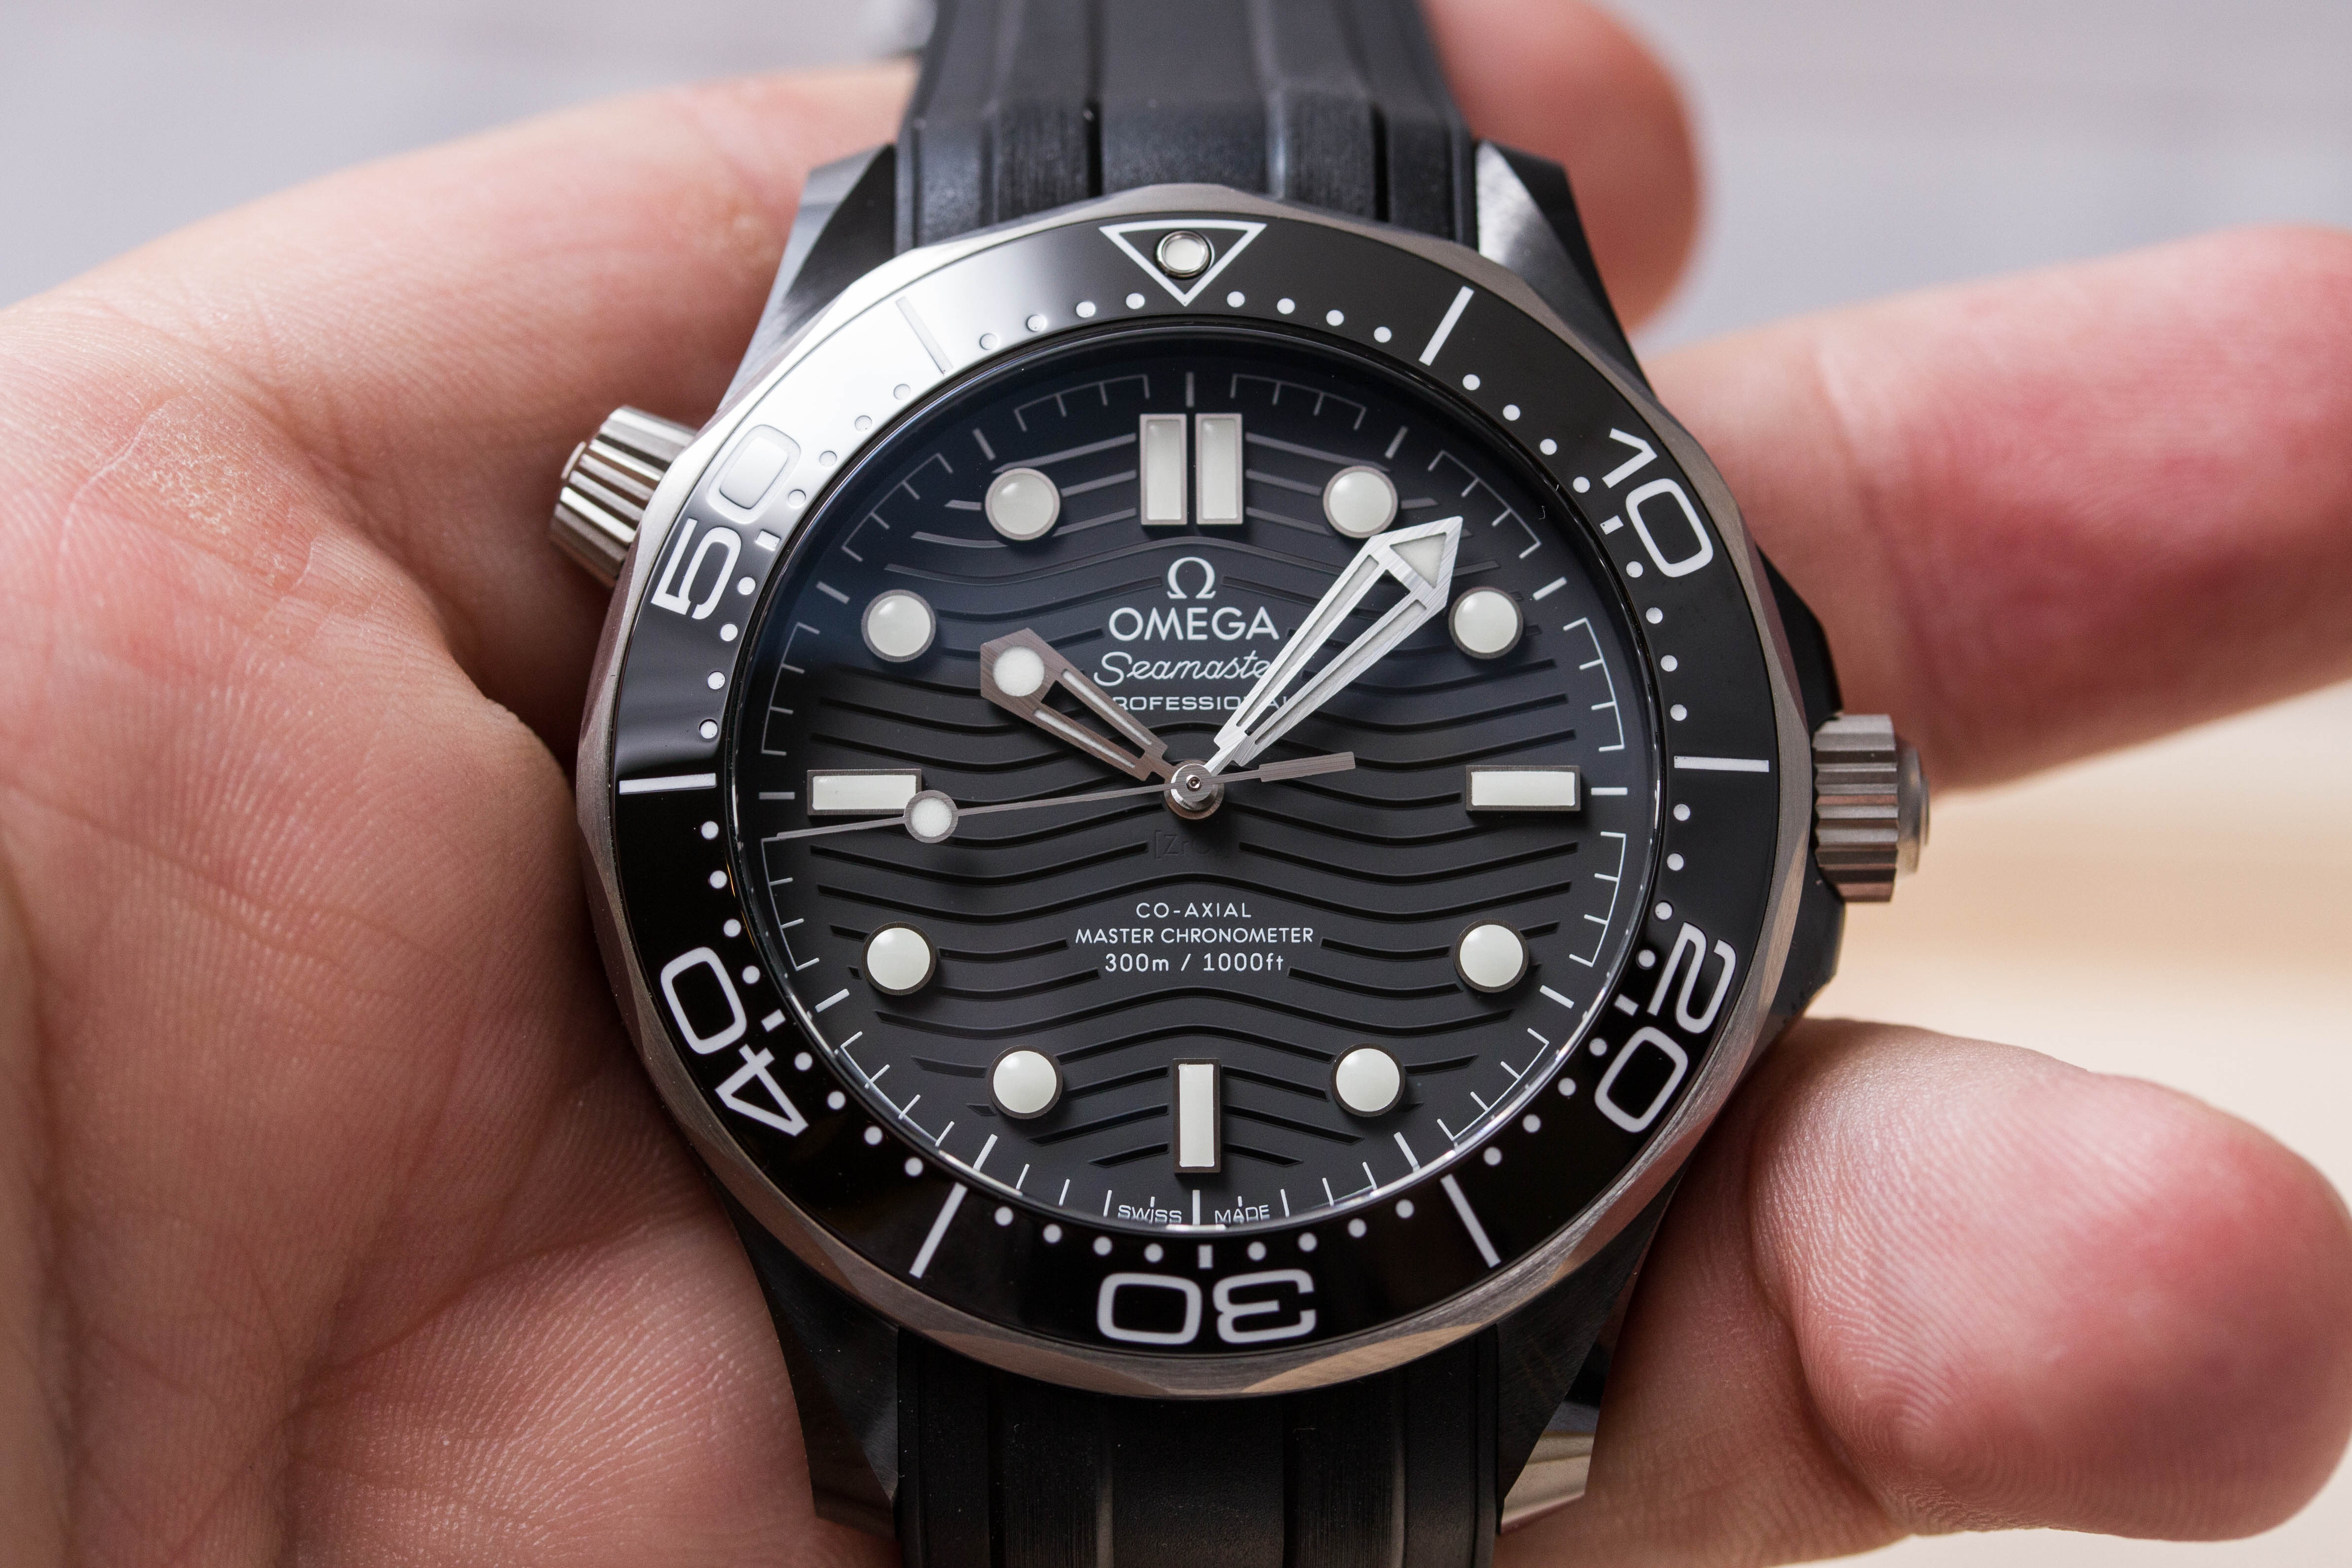 Omega Seamaster Diver 300M Ceramic-and-Titanium no-date - 210.92.44.20.01.001 - review